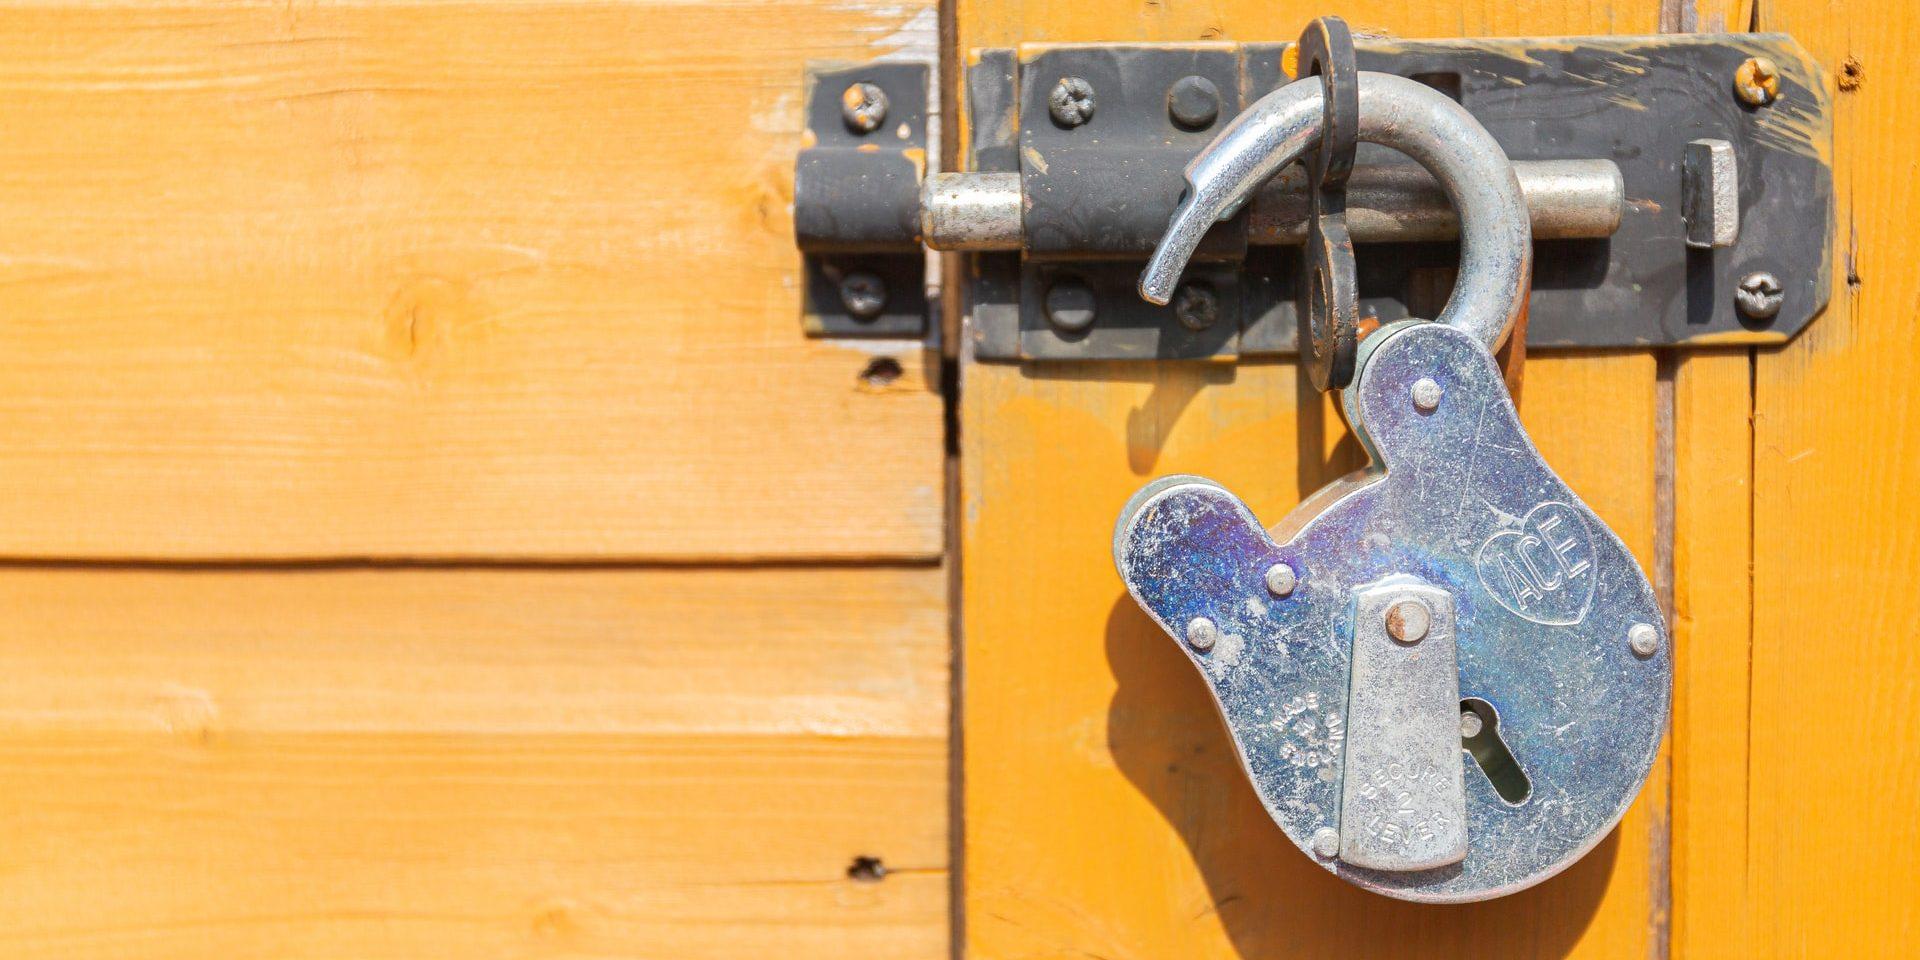 Unlocked old fashioned padlock